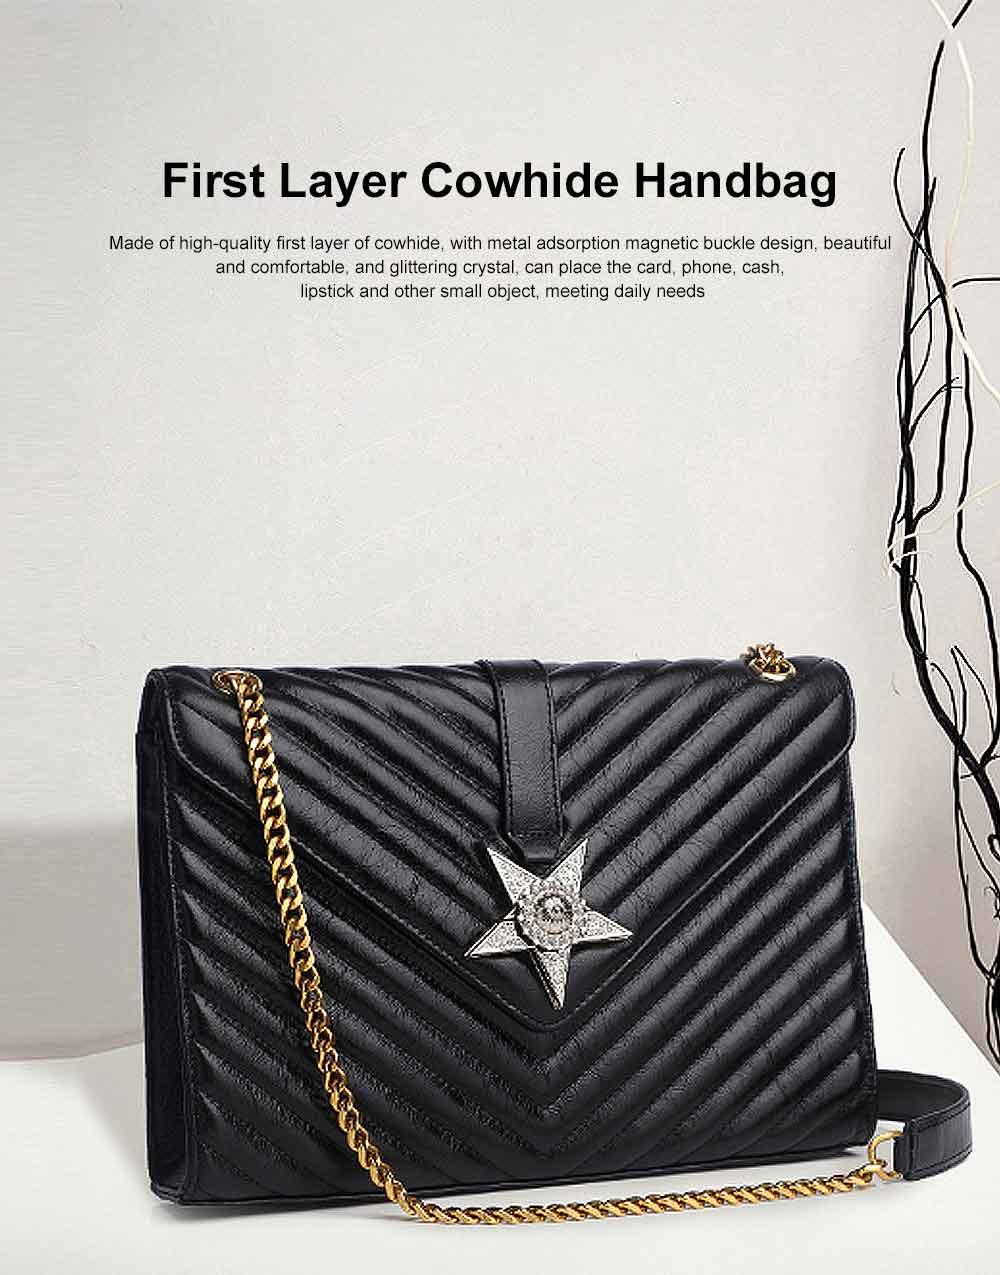 First Layer Cowhide Handbag, New Fashion Star Shoulder Diagonal Bag, with Metal Magnetic Buckle Design 0